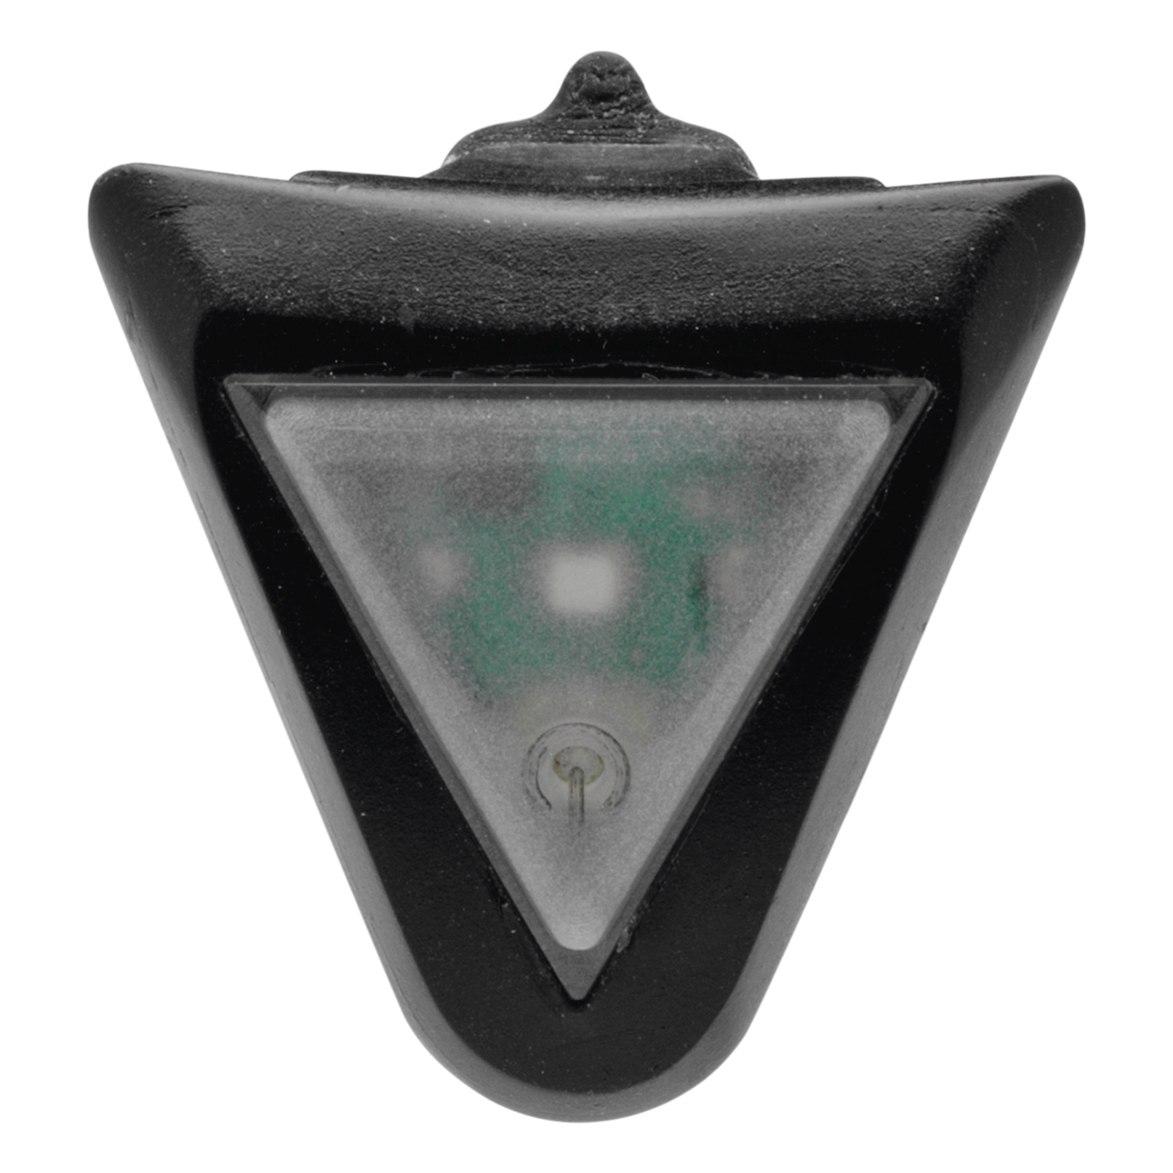 Image of Uvex plug-in LED 0100 i-vo / i-vo c / i-vo cc / city i-vo / air wing LED / finale junior LED - Safety Light